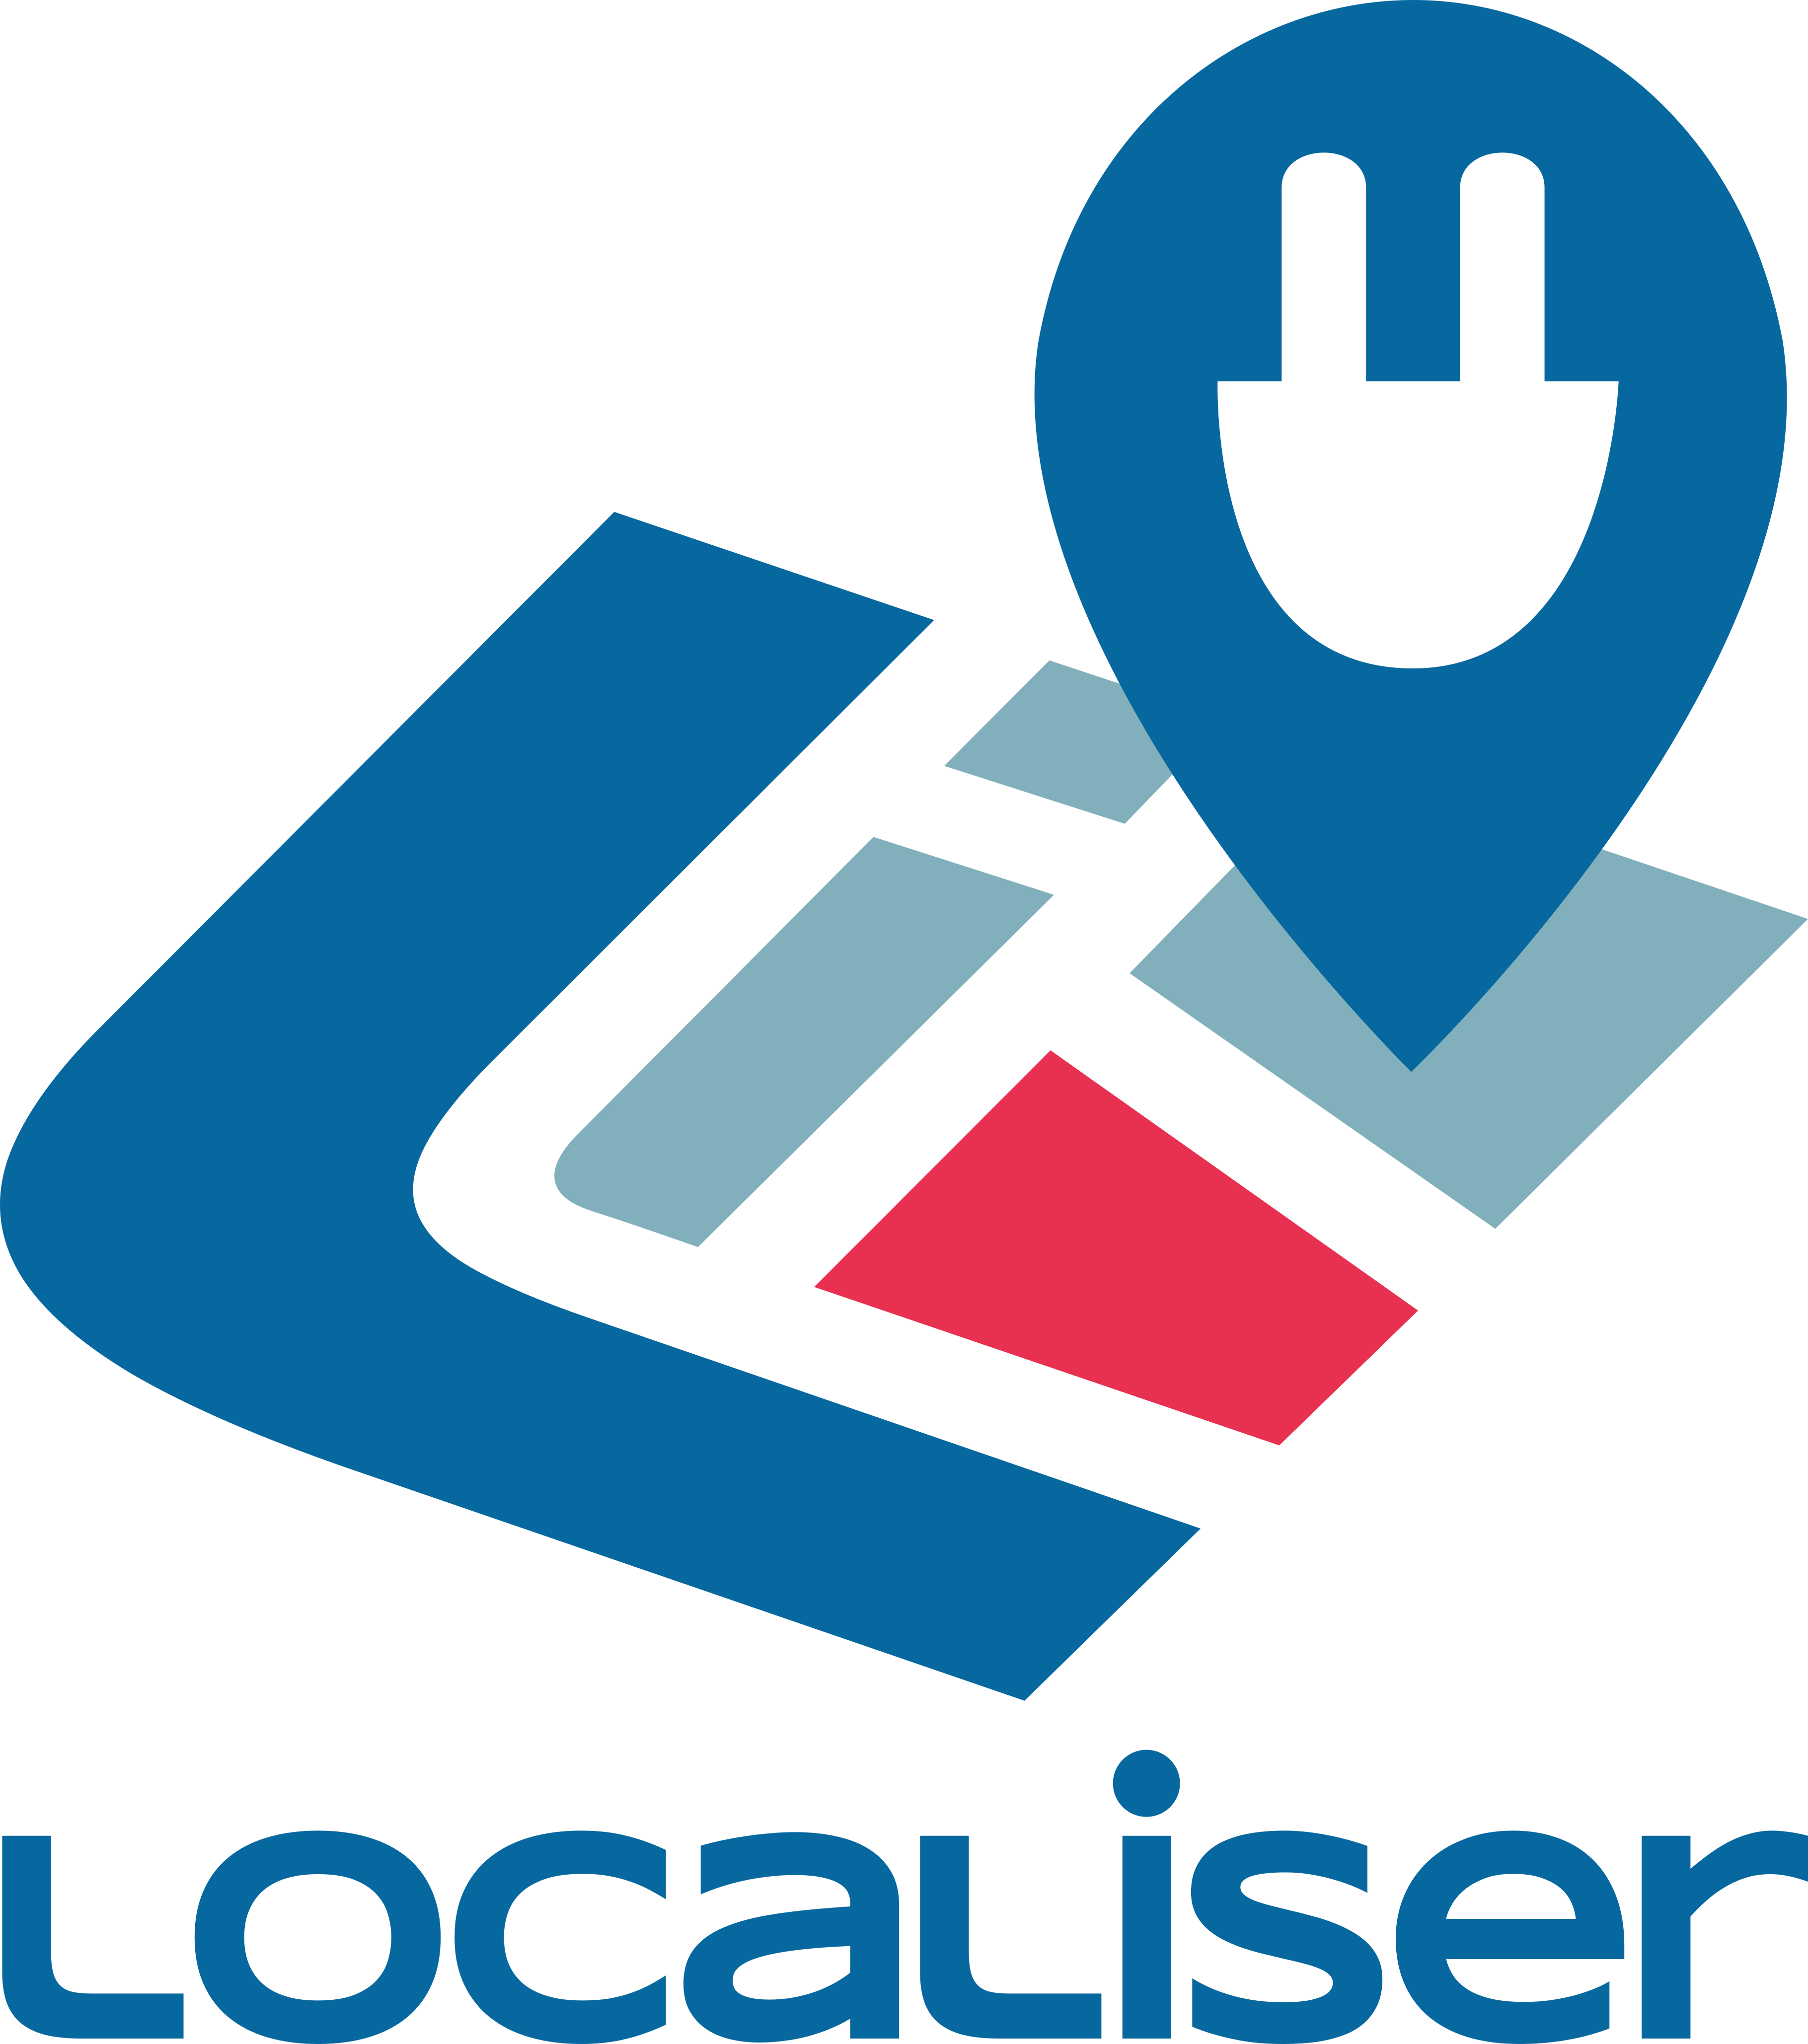 Localiser RLI GmbH